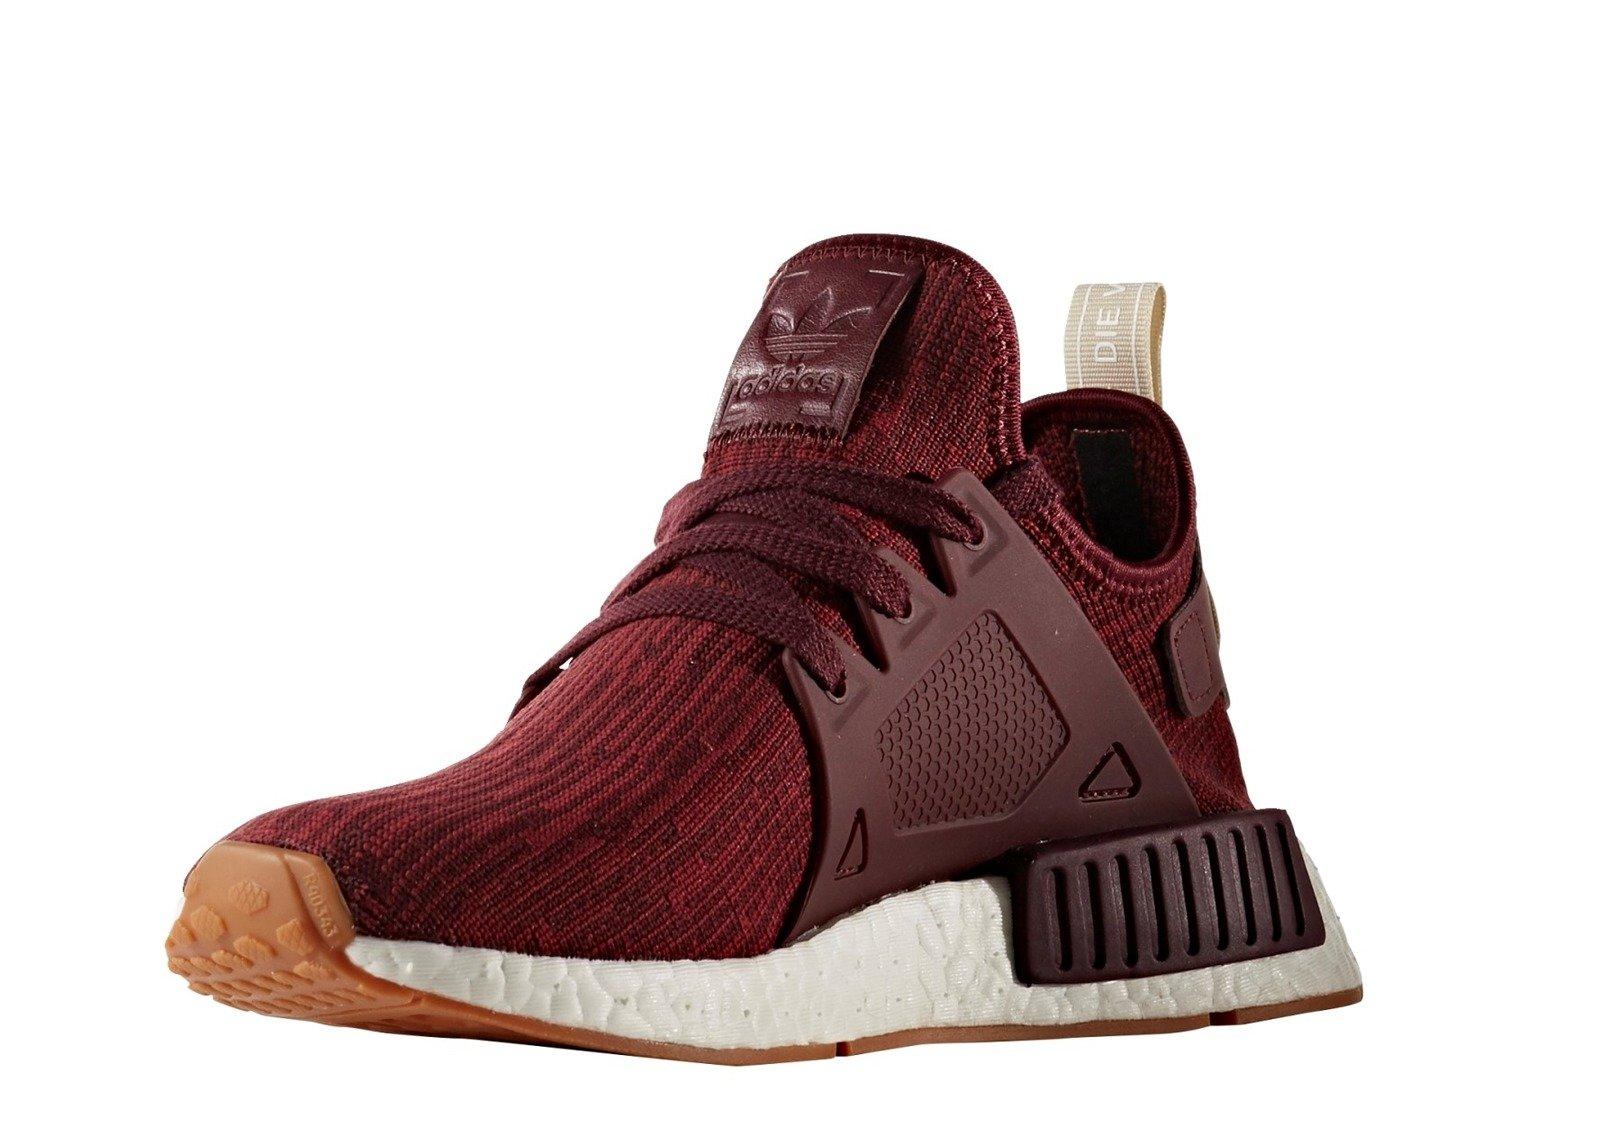 bfcddb7075ac Buy maroon adidas basketball shoes   OFF68% Discounted